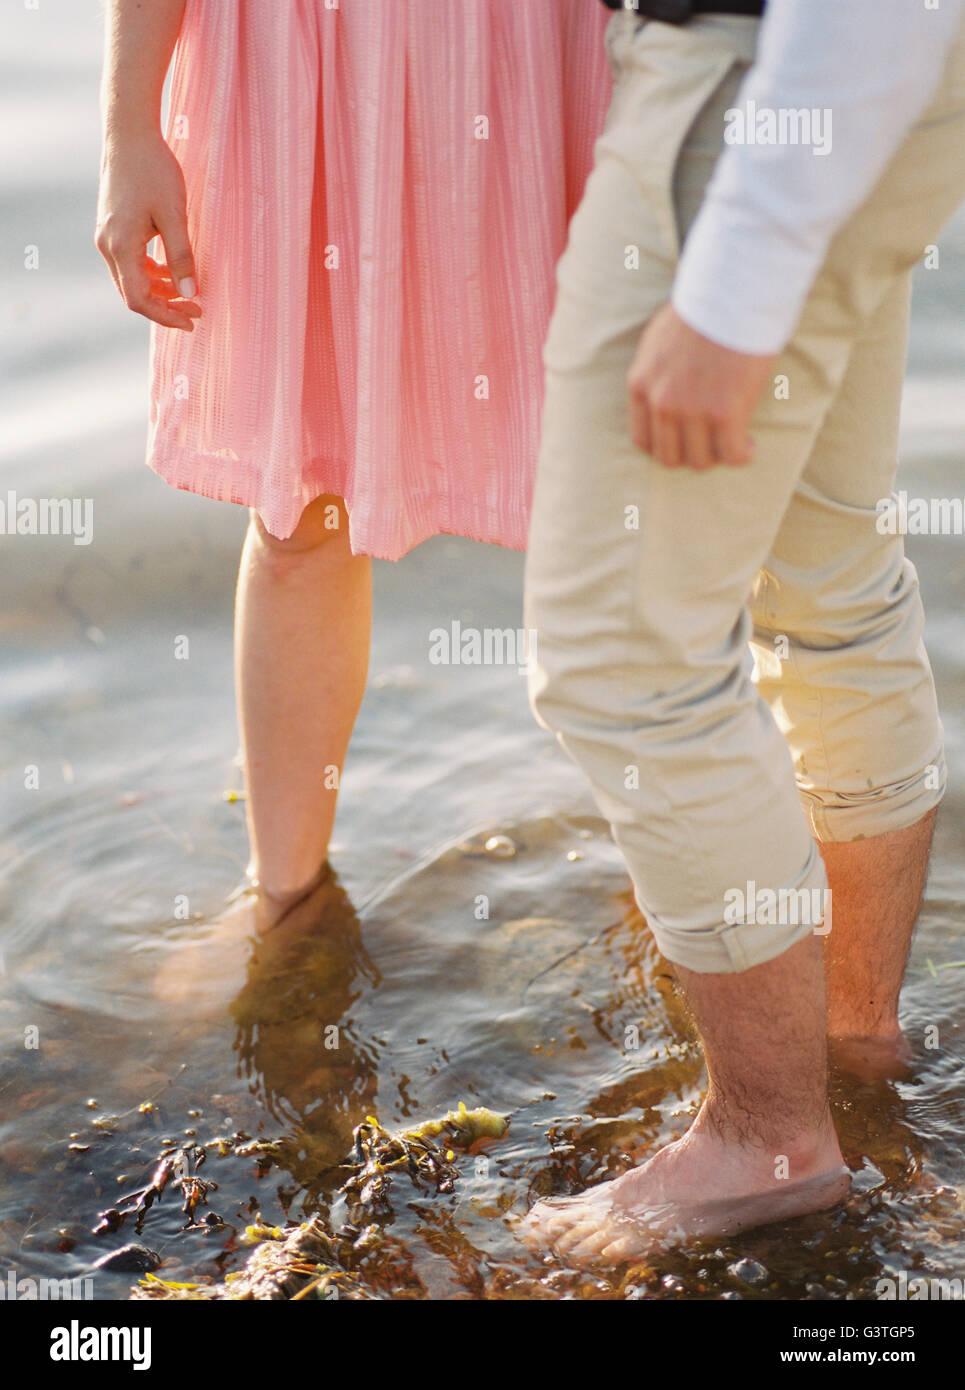 Sweden, Bohuslan, Fjallbacka, Couple standing barefoot in water - Stock Image